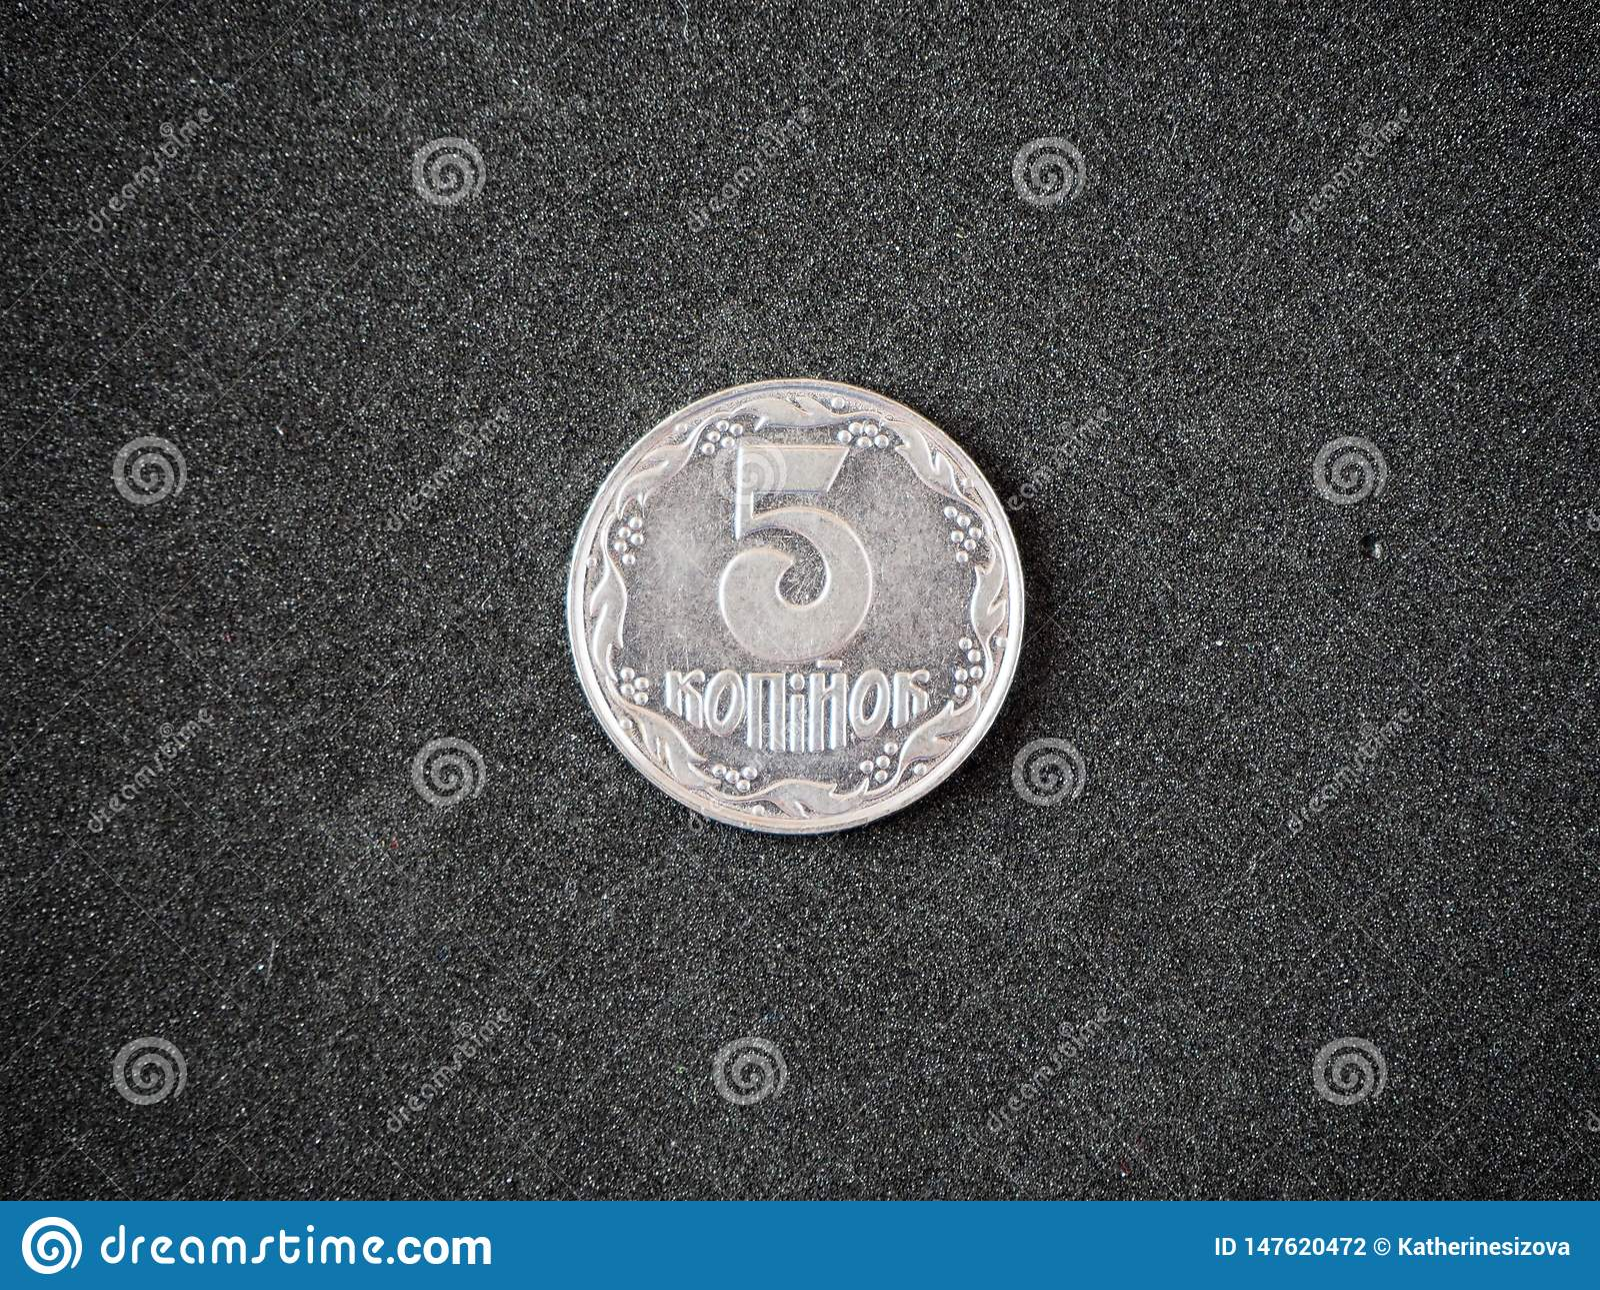 Old coin of Ukraine. 5 kopecks kopeika 1992 front side isolated